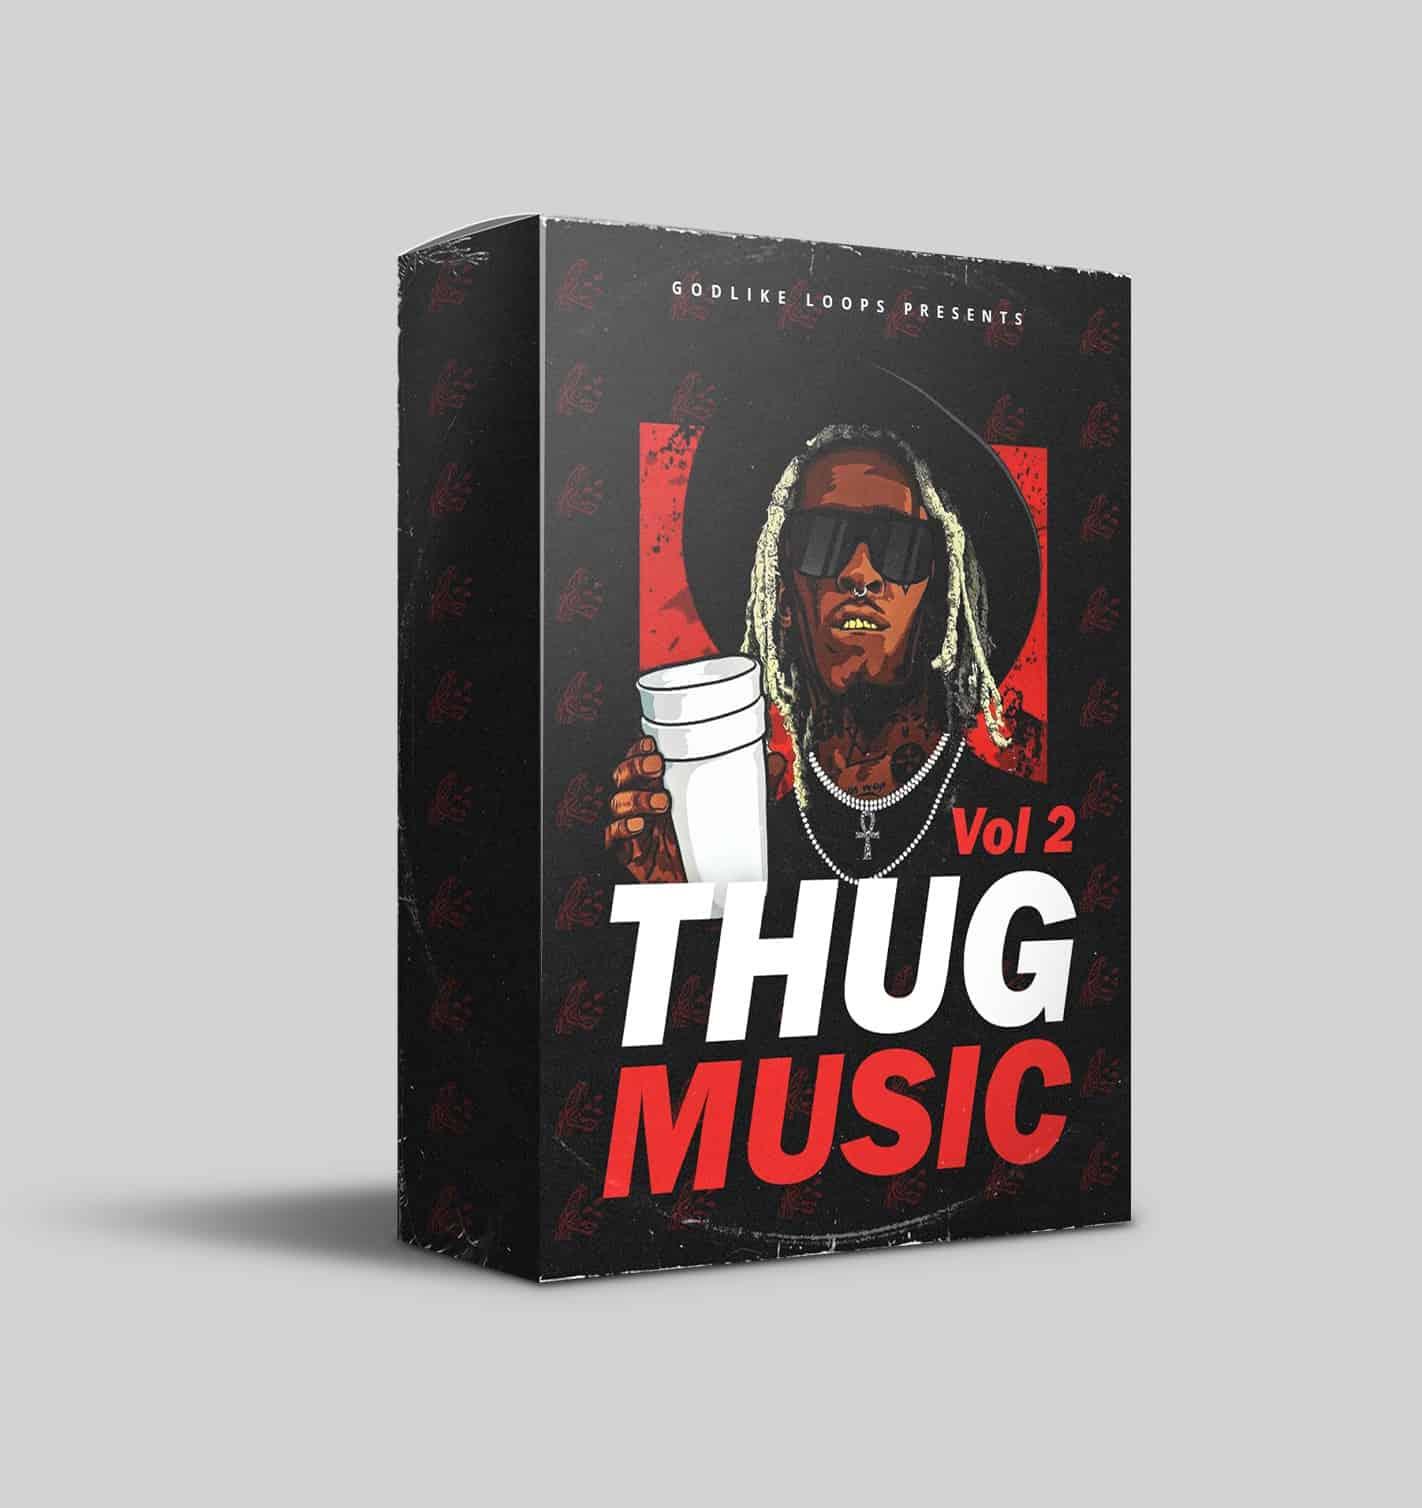 Godlike Loops - Thug Music Vol.2